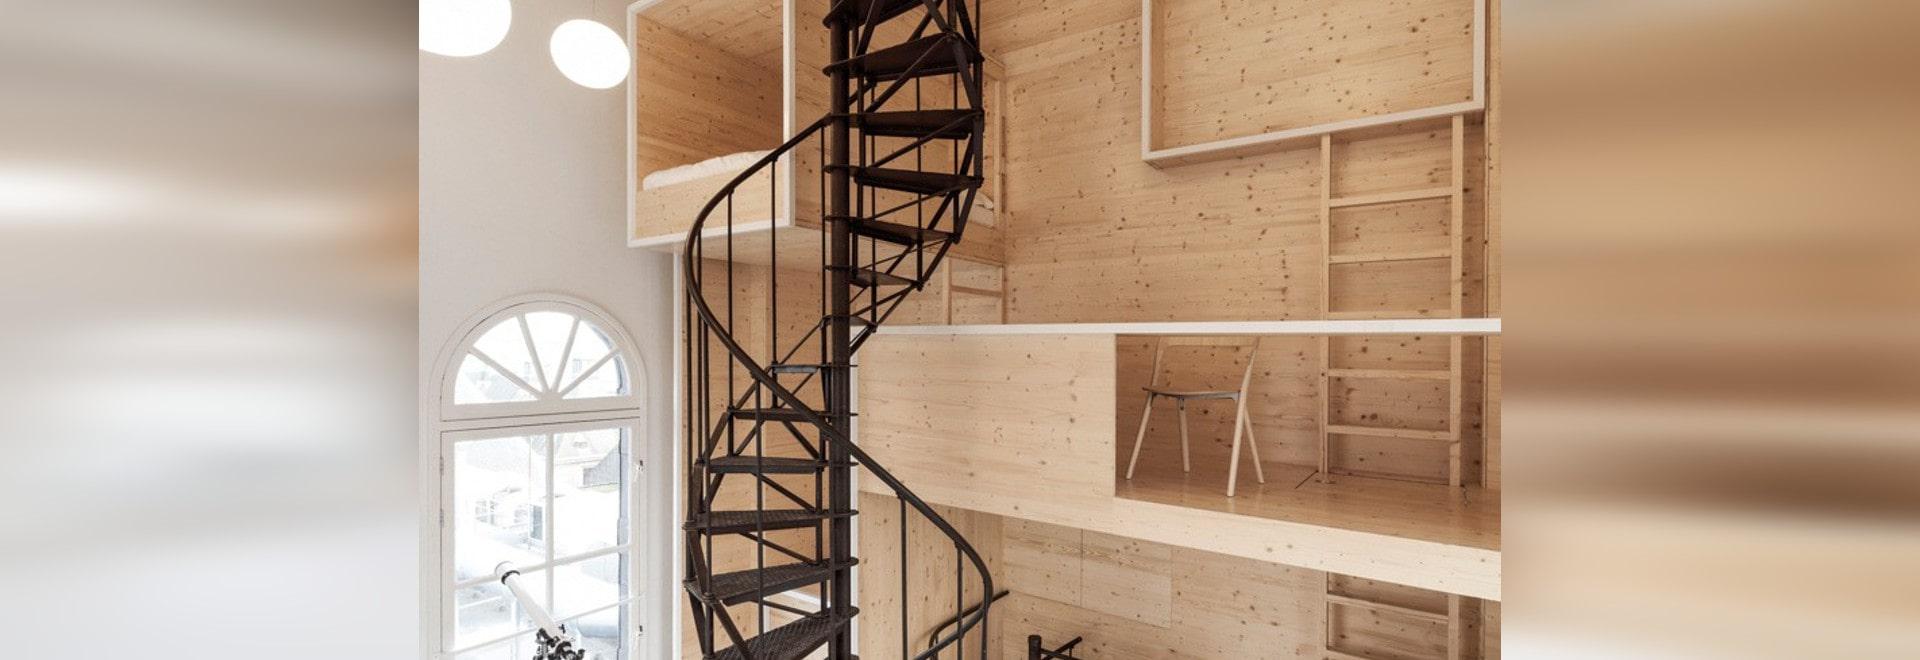 http://img.archiexpo.fr/images_ae/projects/images-og/magasin-cree-salle-vivre-interieur-tour-leur-toit-1085-8429431.jpg